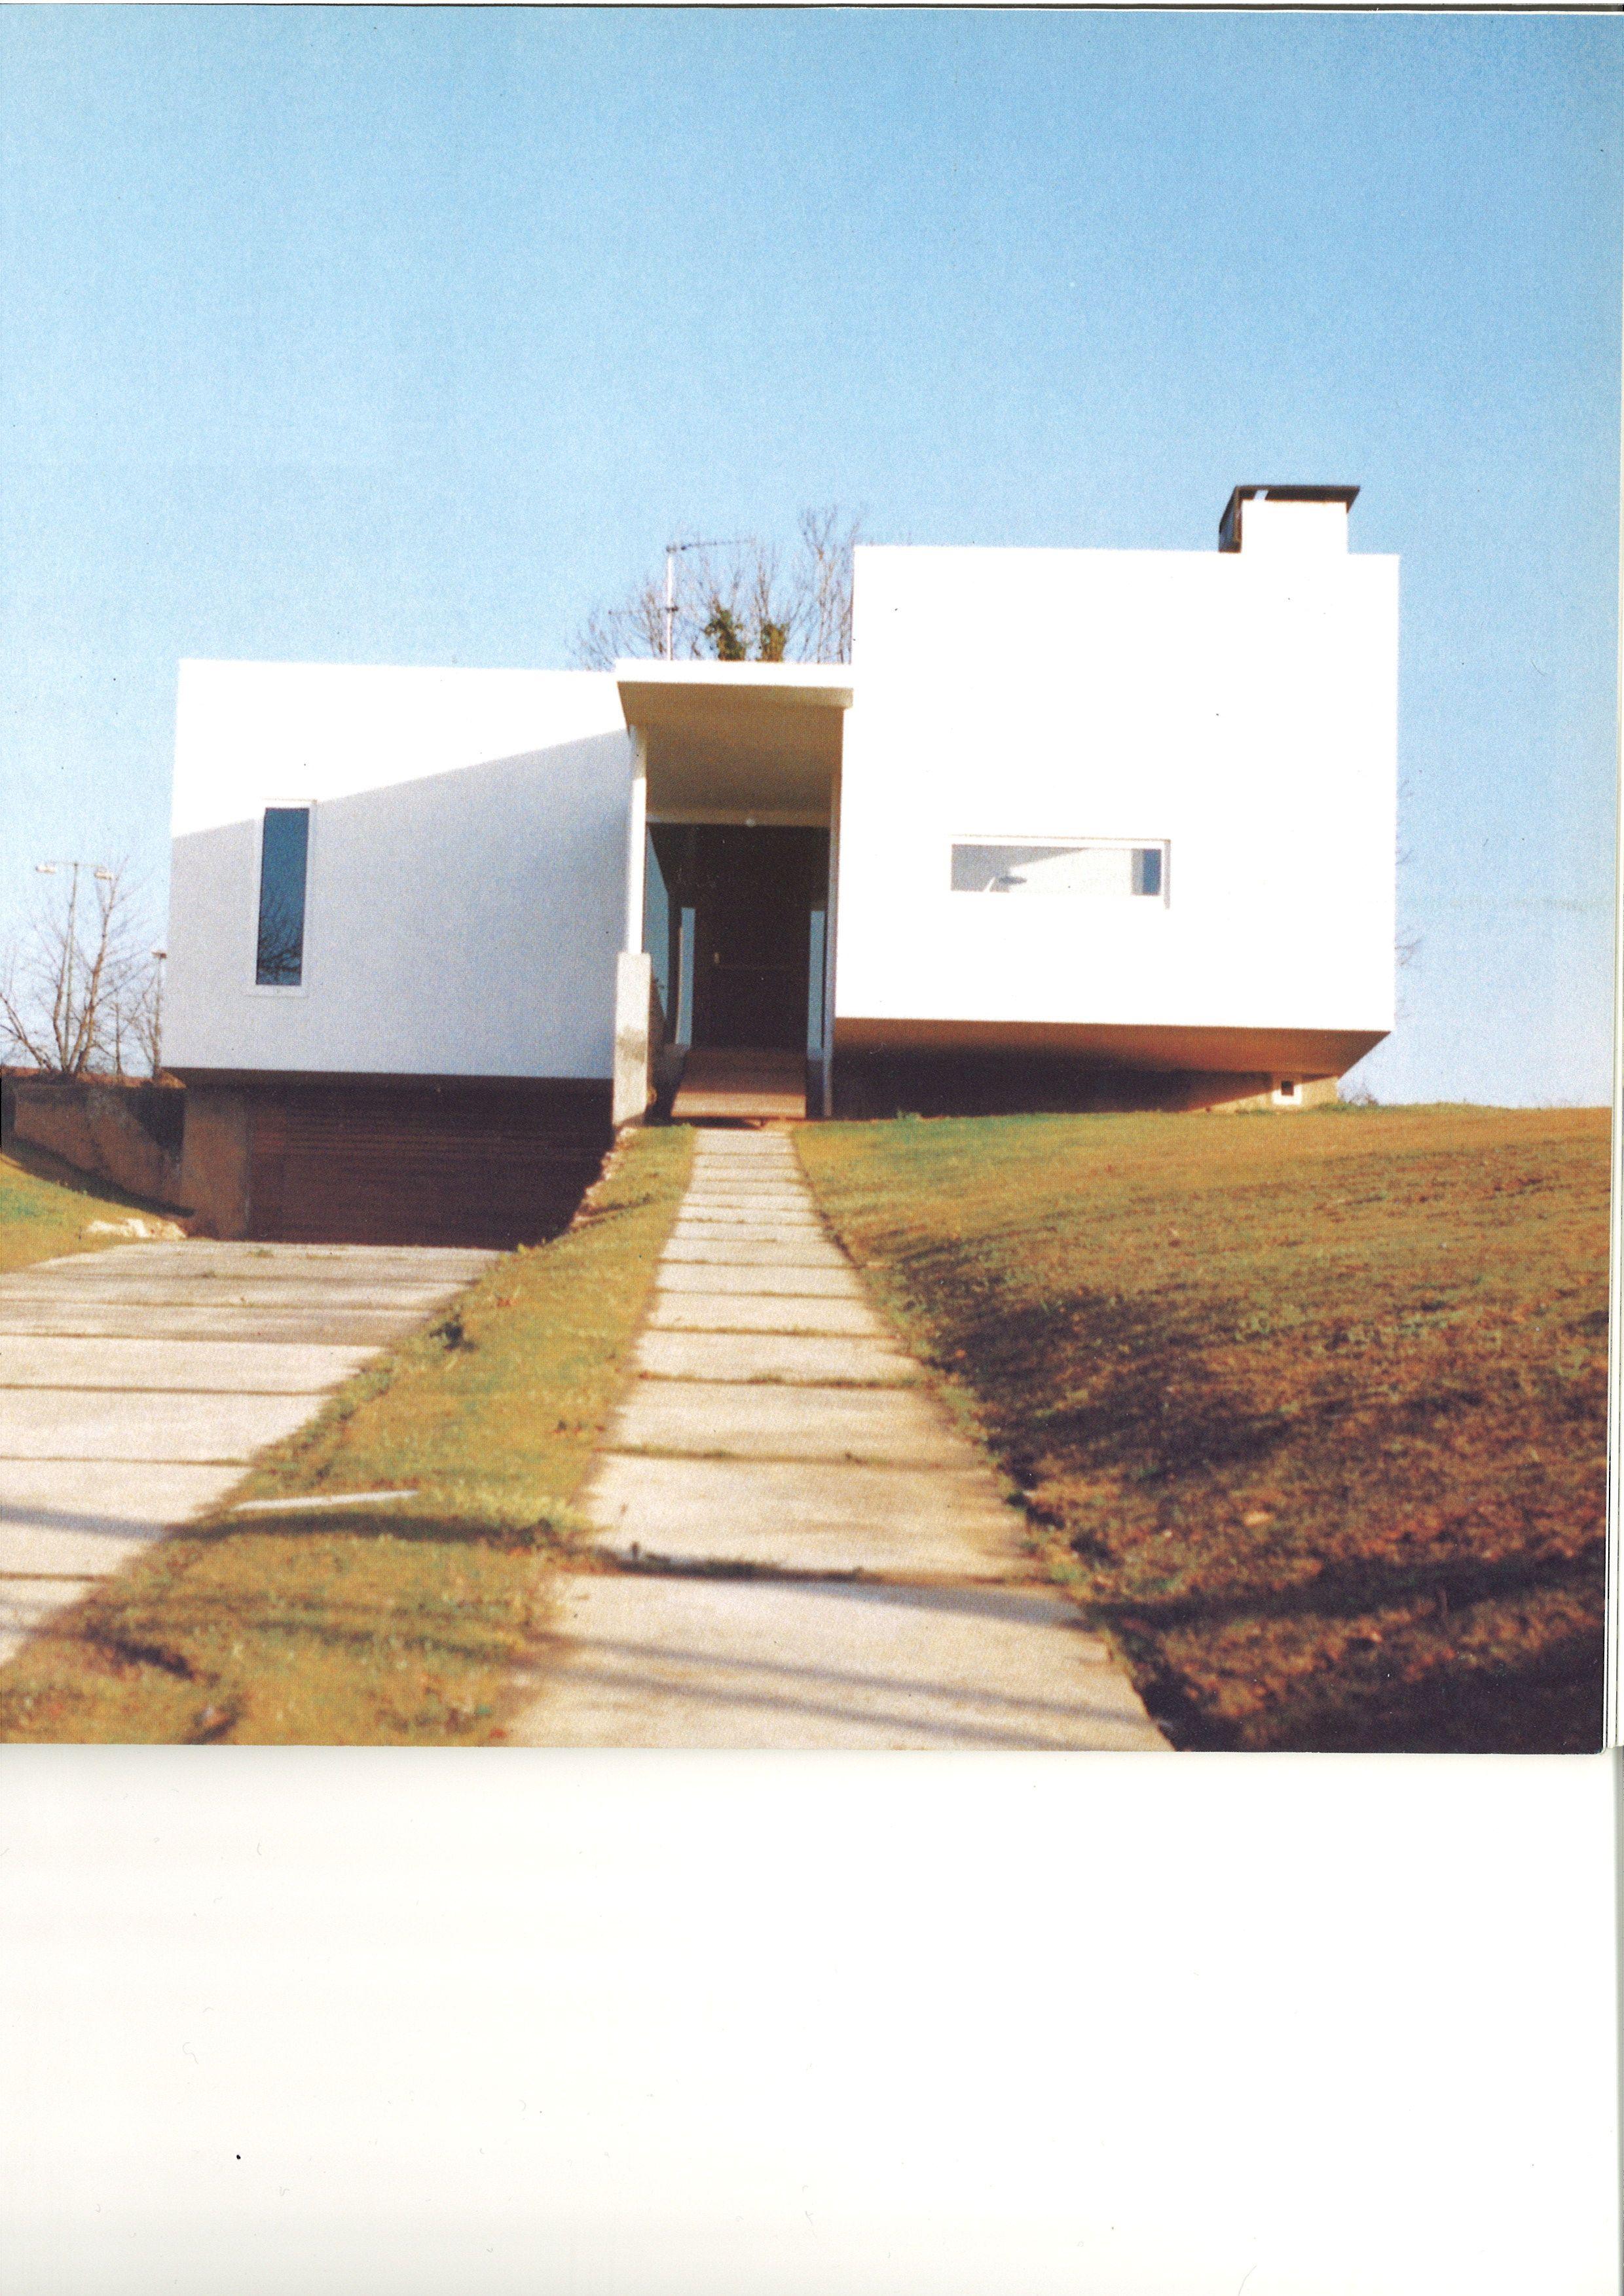 Xv premio asturias de arquitectura 2000 vivienda unifamiliar ti ana oviedo en cat logo - Arquitectos en oviedo ...